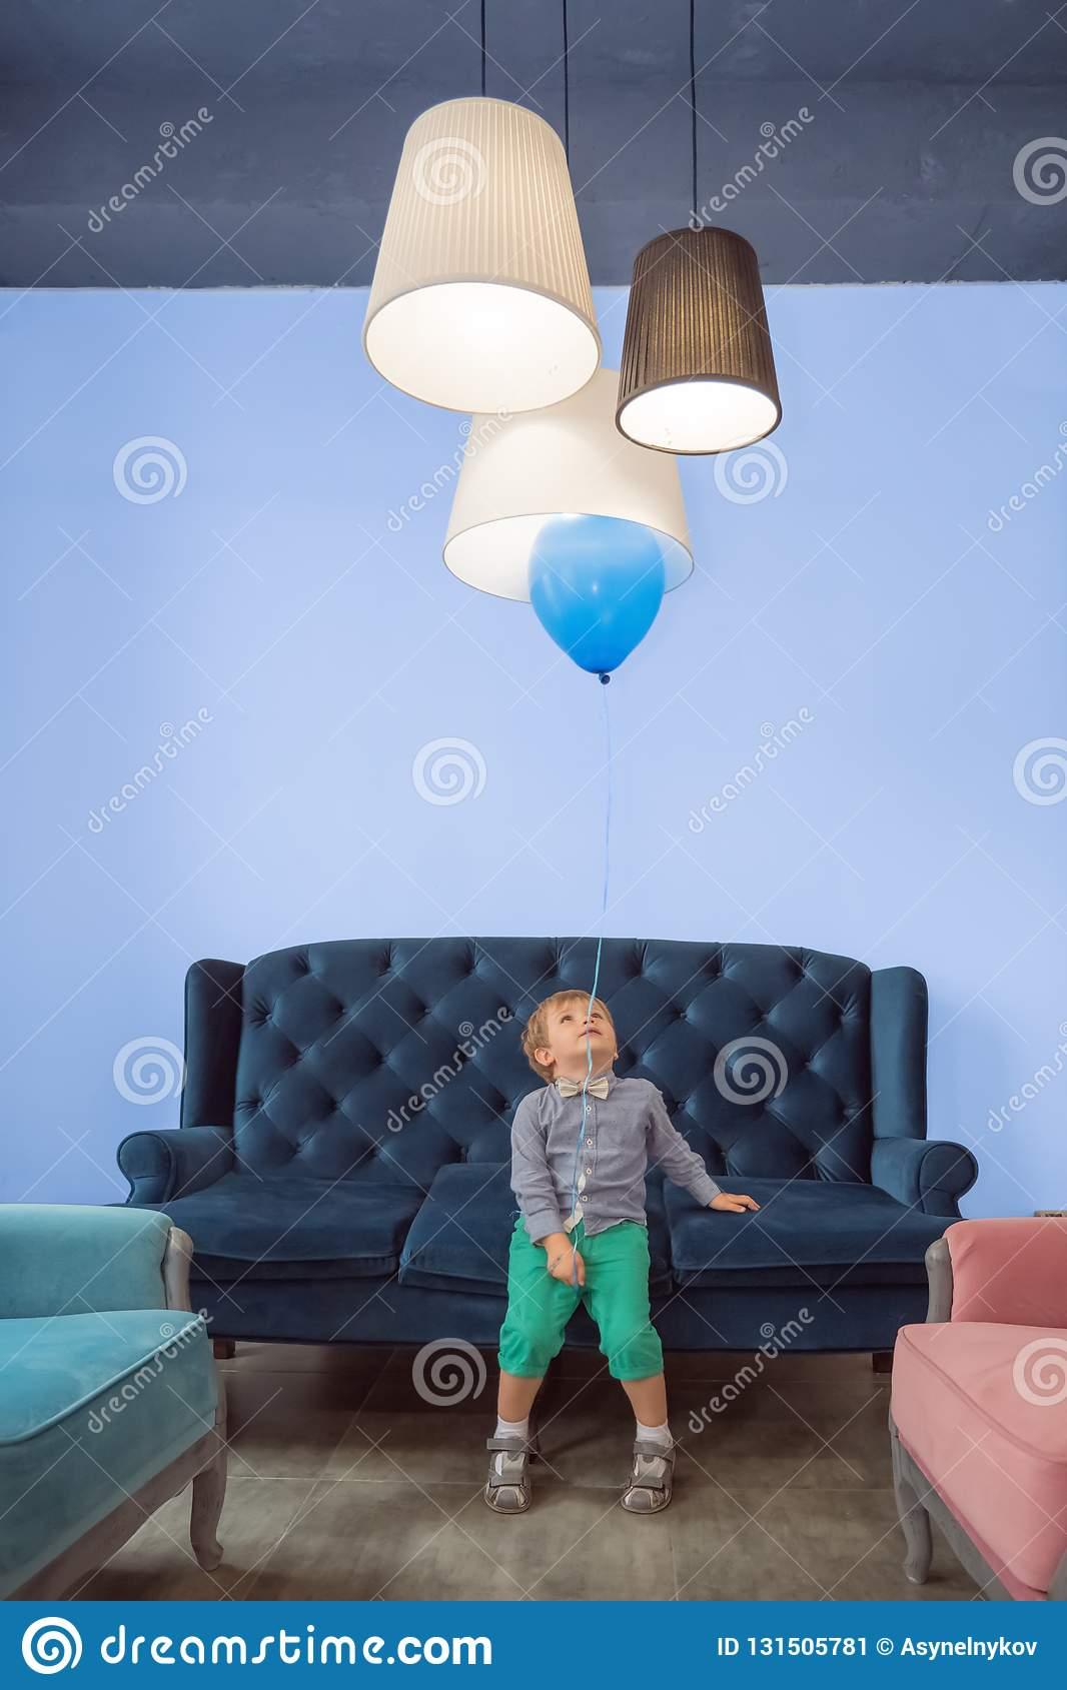 Positive child having fun with balloon. Children celebration background.